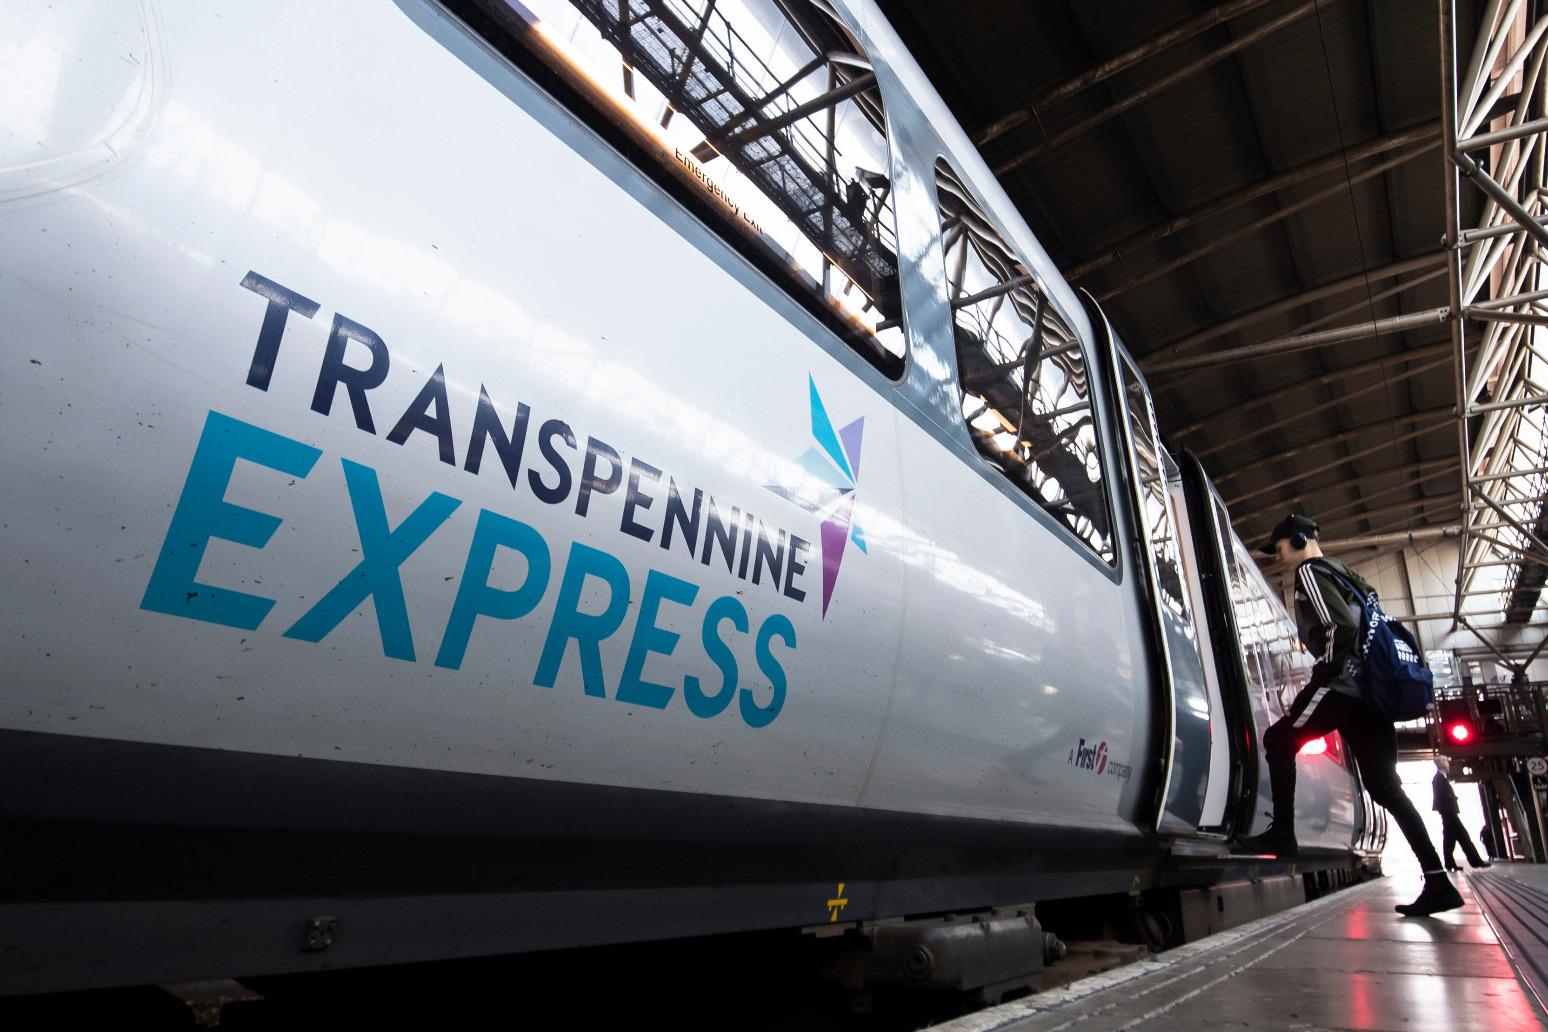 Train operator handed target for major improvement